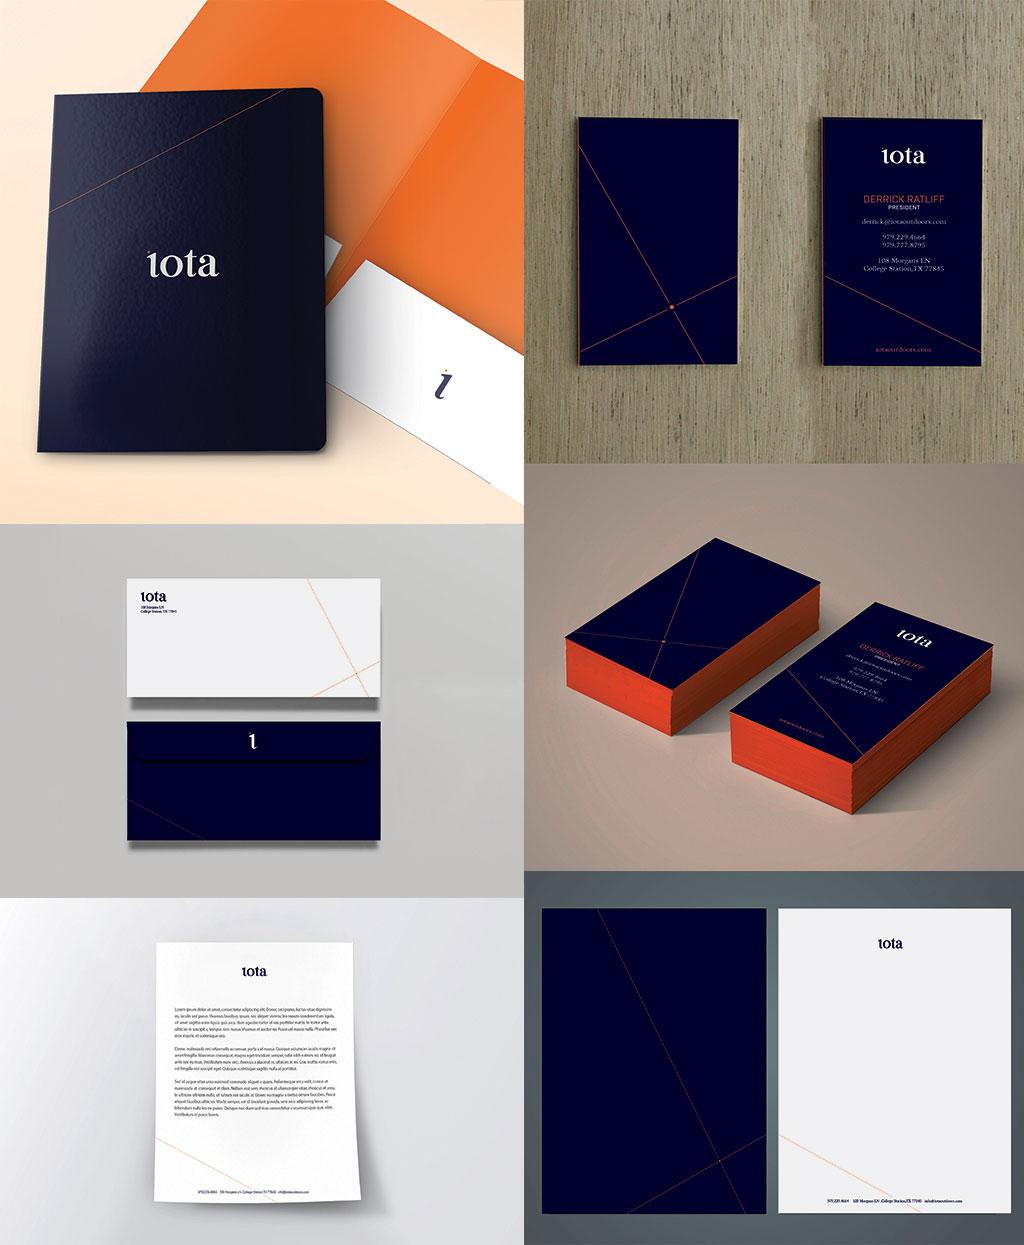 iota print materials